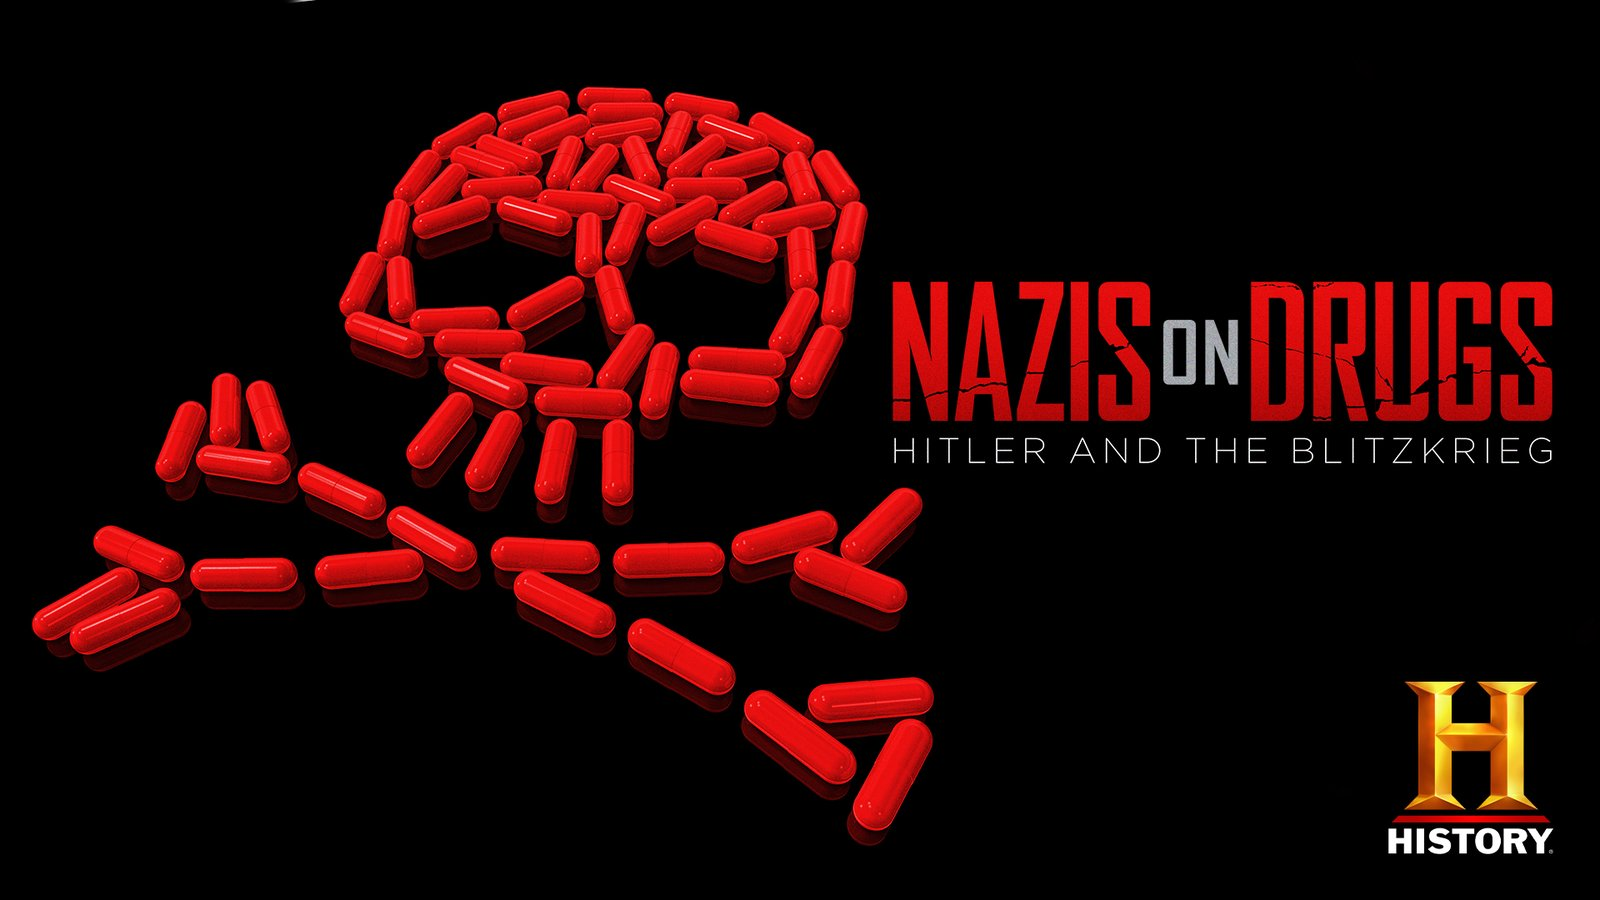 Nazis on Drugs: Hitler and the Blitzkrieg